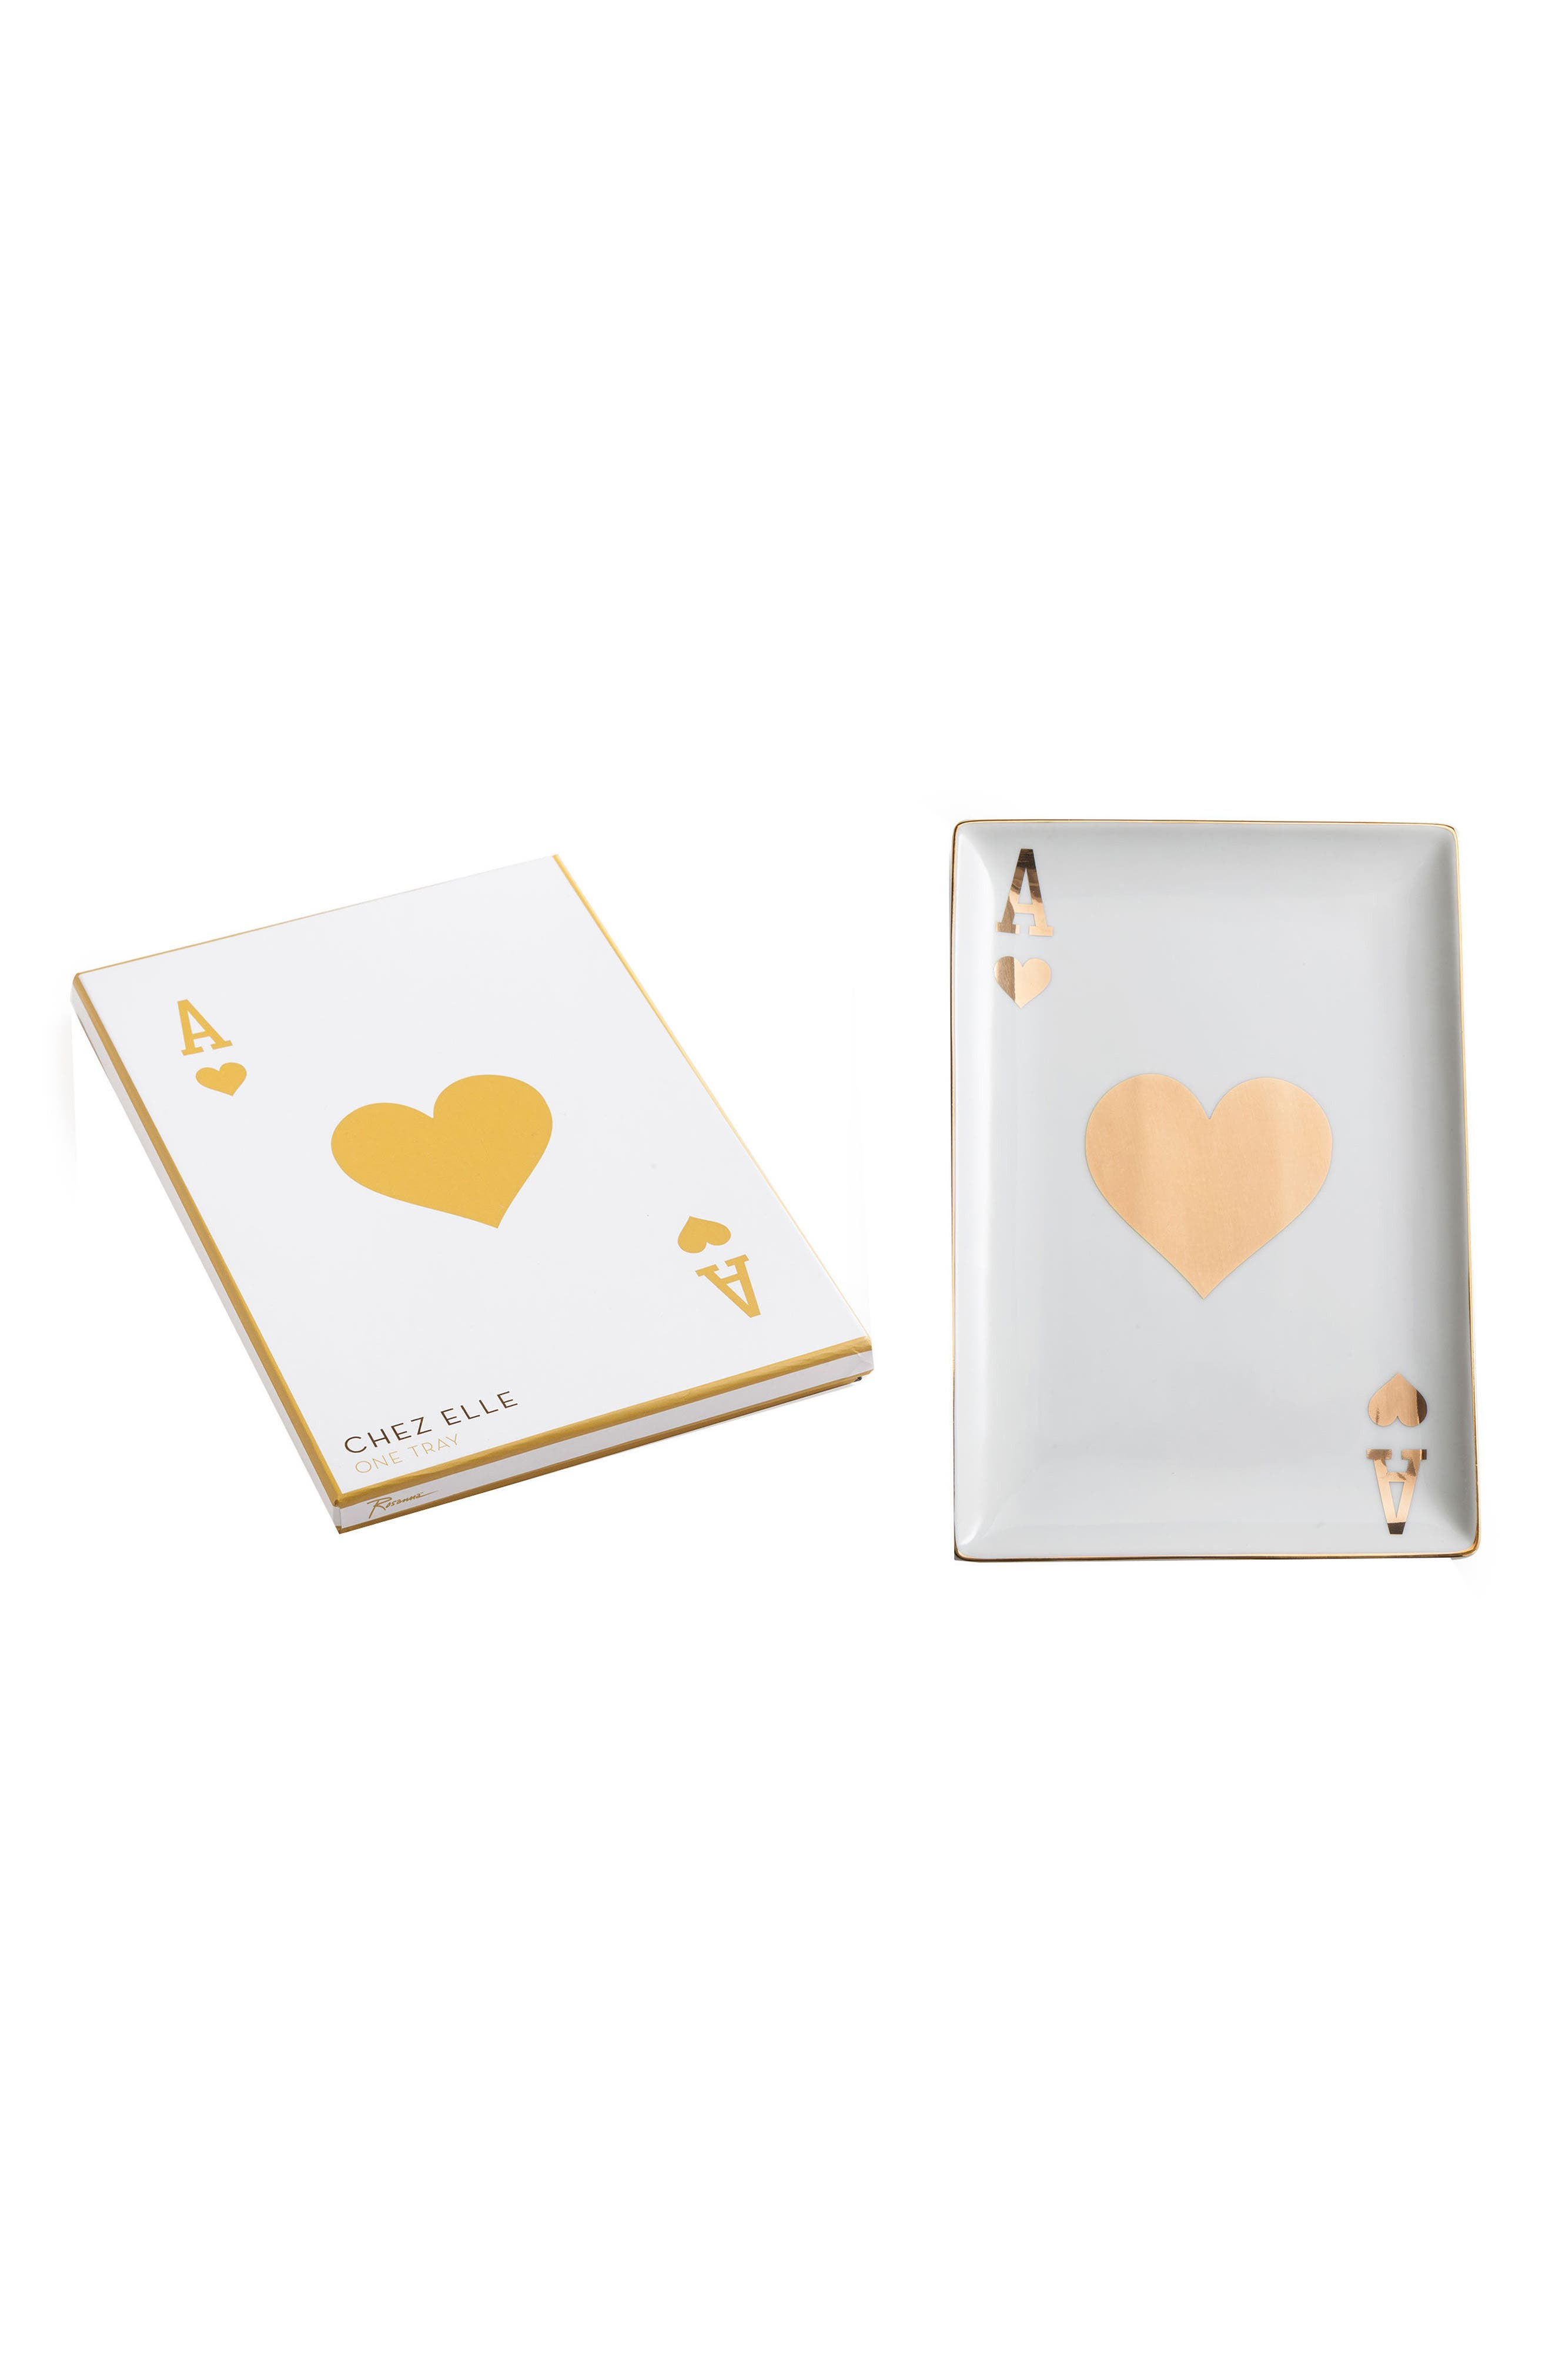 Playing Card Porcelain Trinket Tray,                             Main thumbnail 2, color,